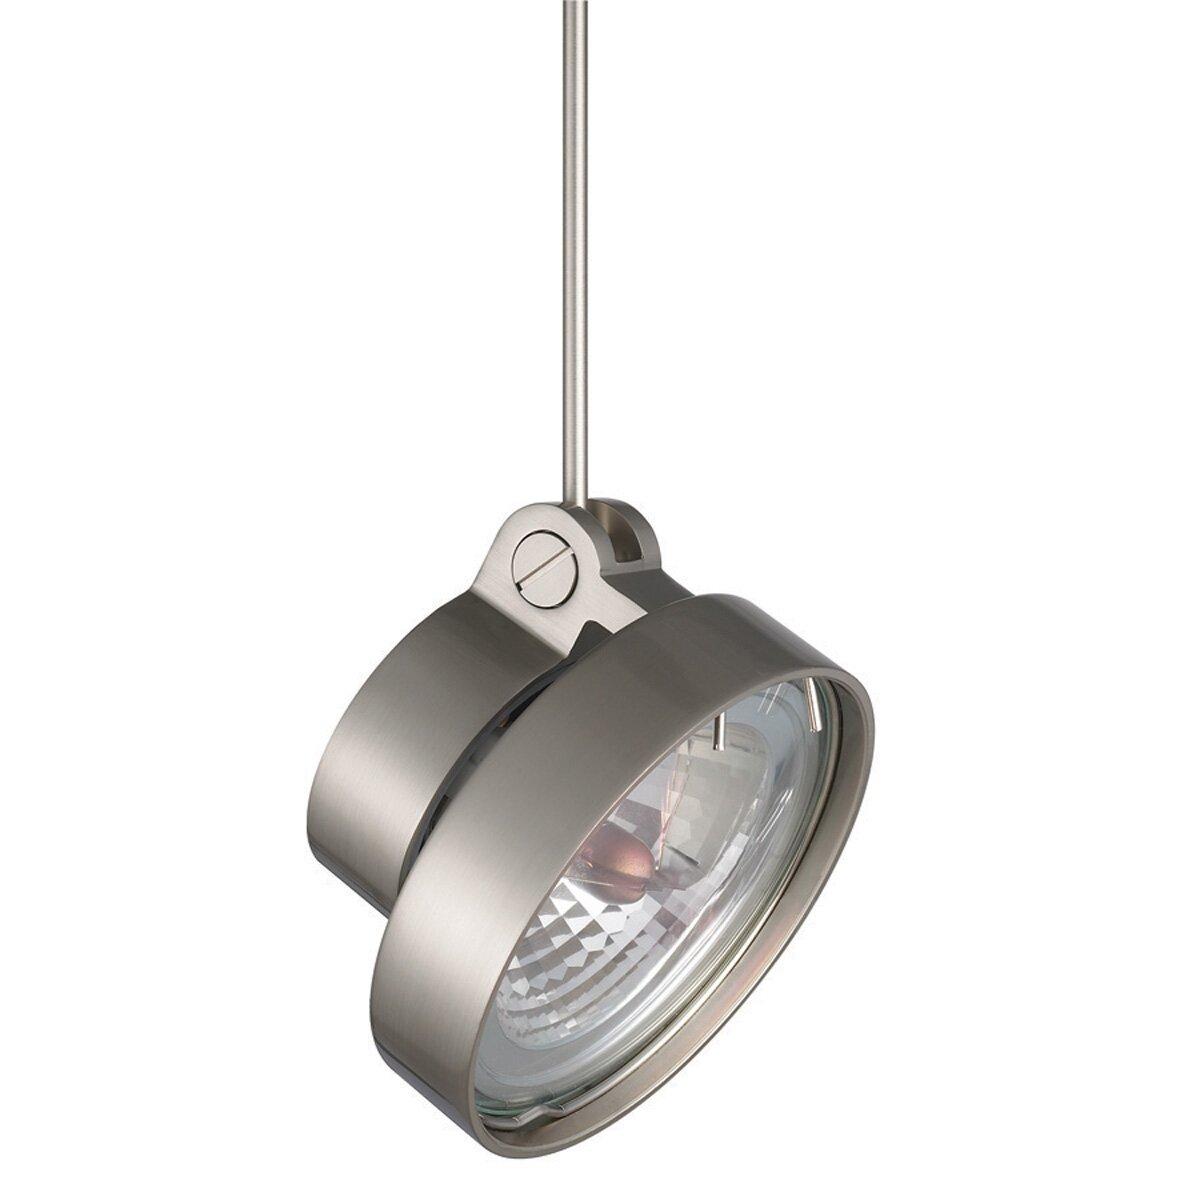 Flexible Track Lighting With Pendants: WAC Lighting 1 Light Quick Connect Flexible Stem Track